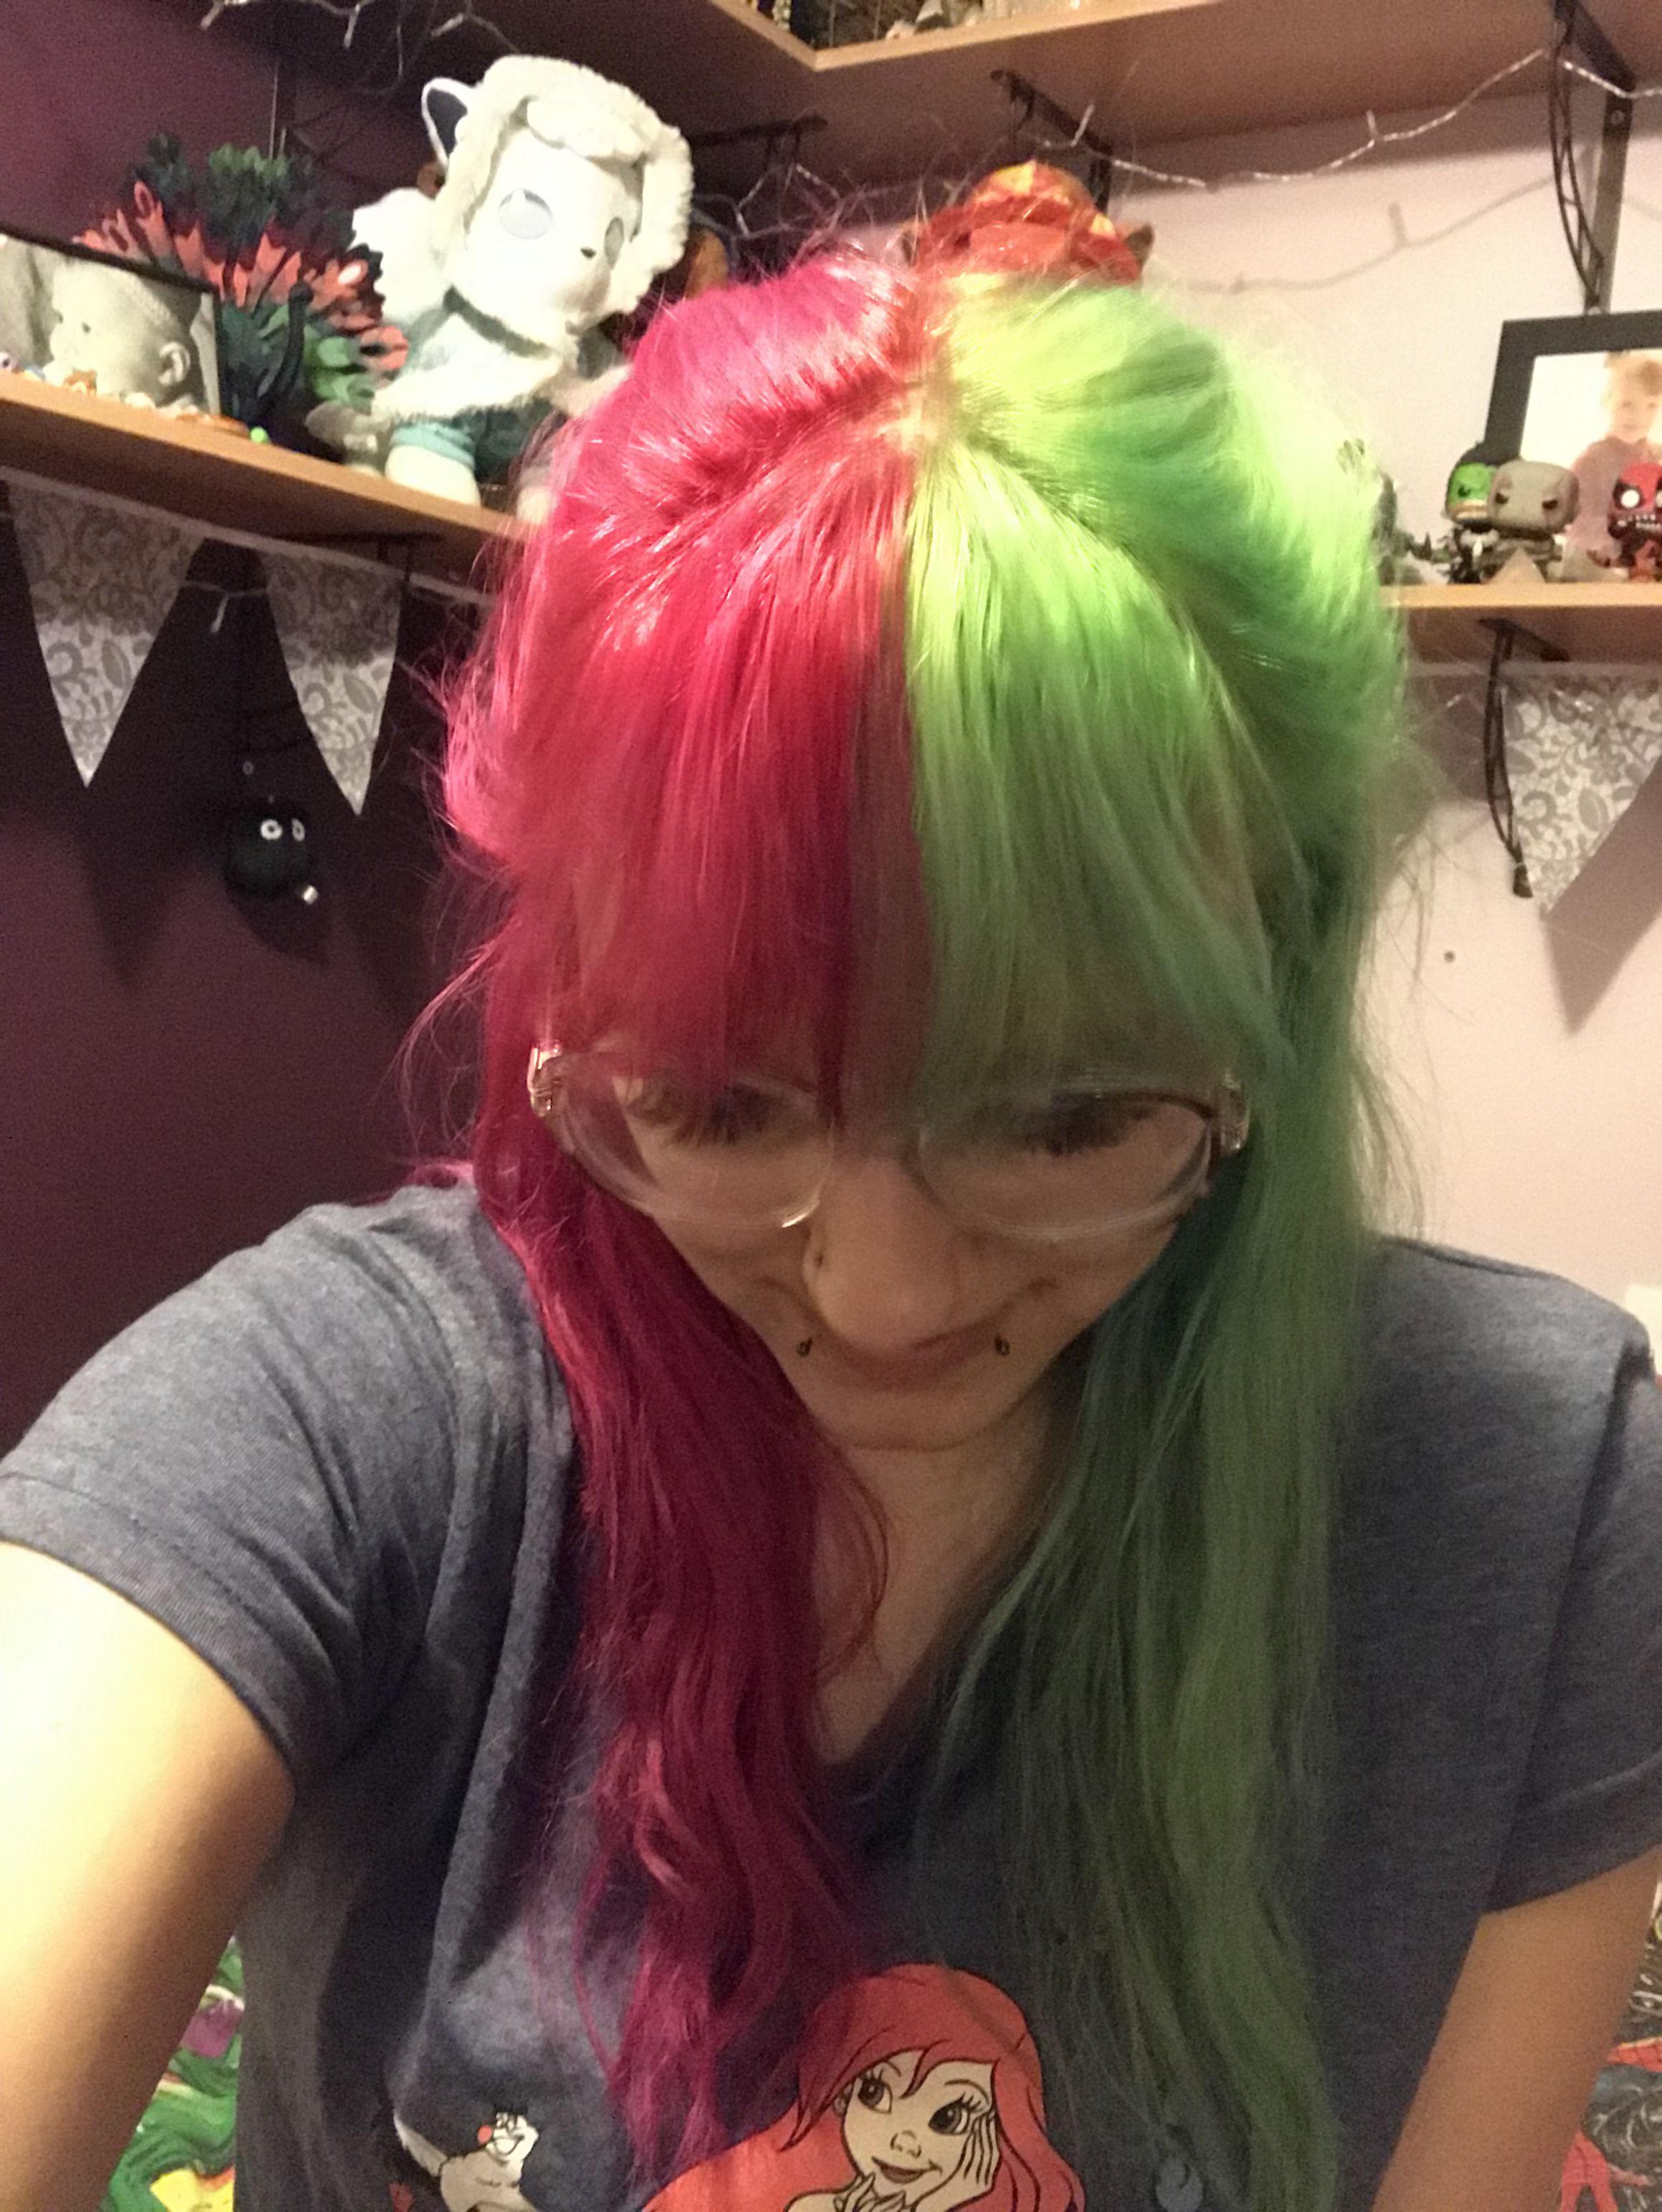 Pink And Green Split In 2020 Green Hair Aesthetic Hair Split Dyed Hair